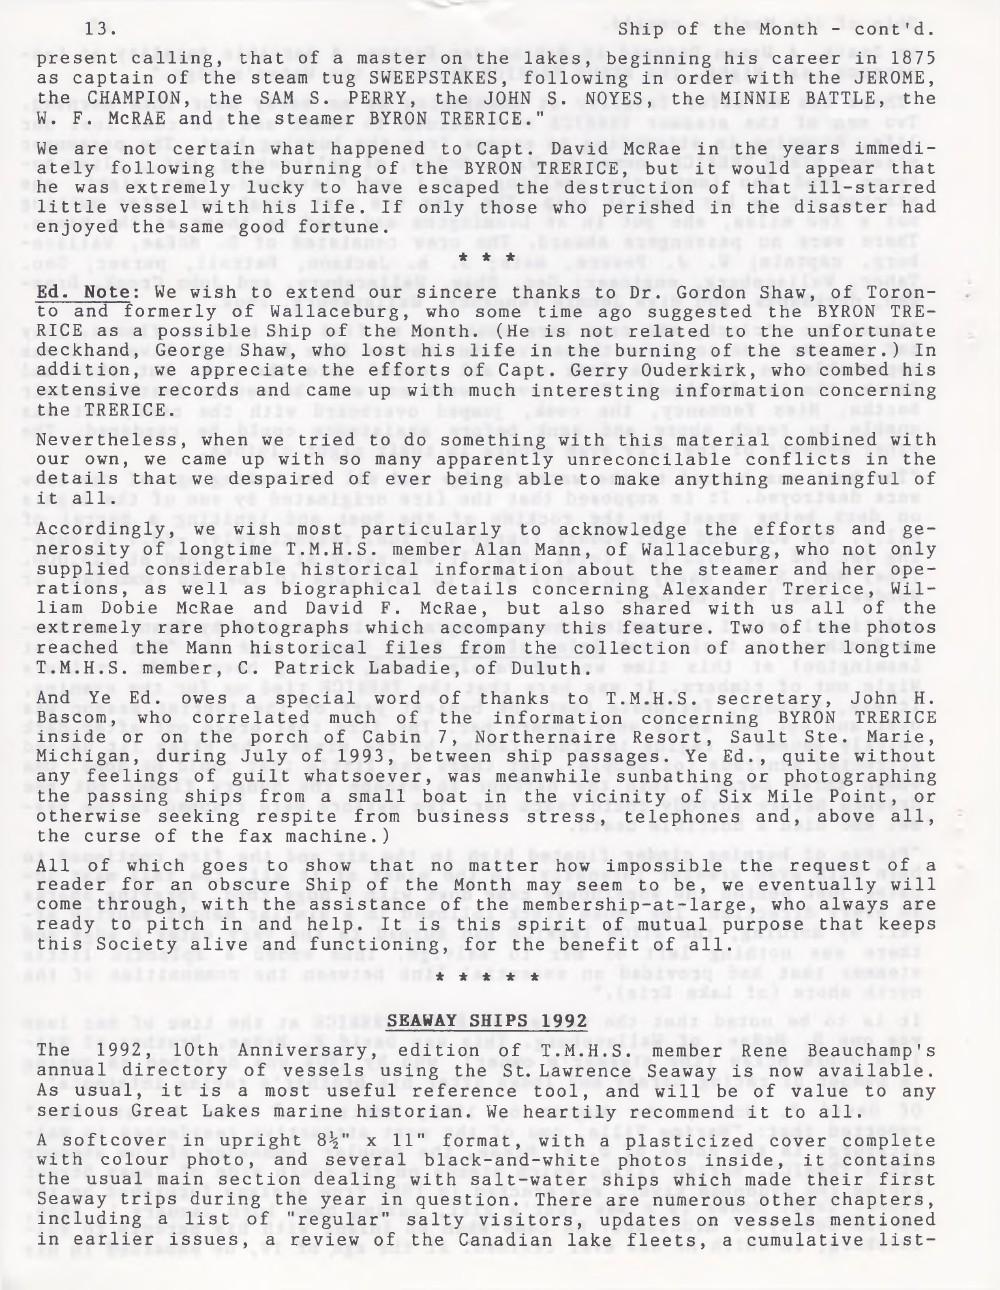 Scanner, v. 25, no. 9 (Mid-Summer 1993)